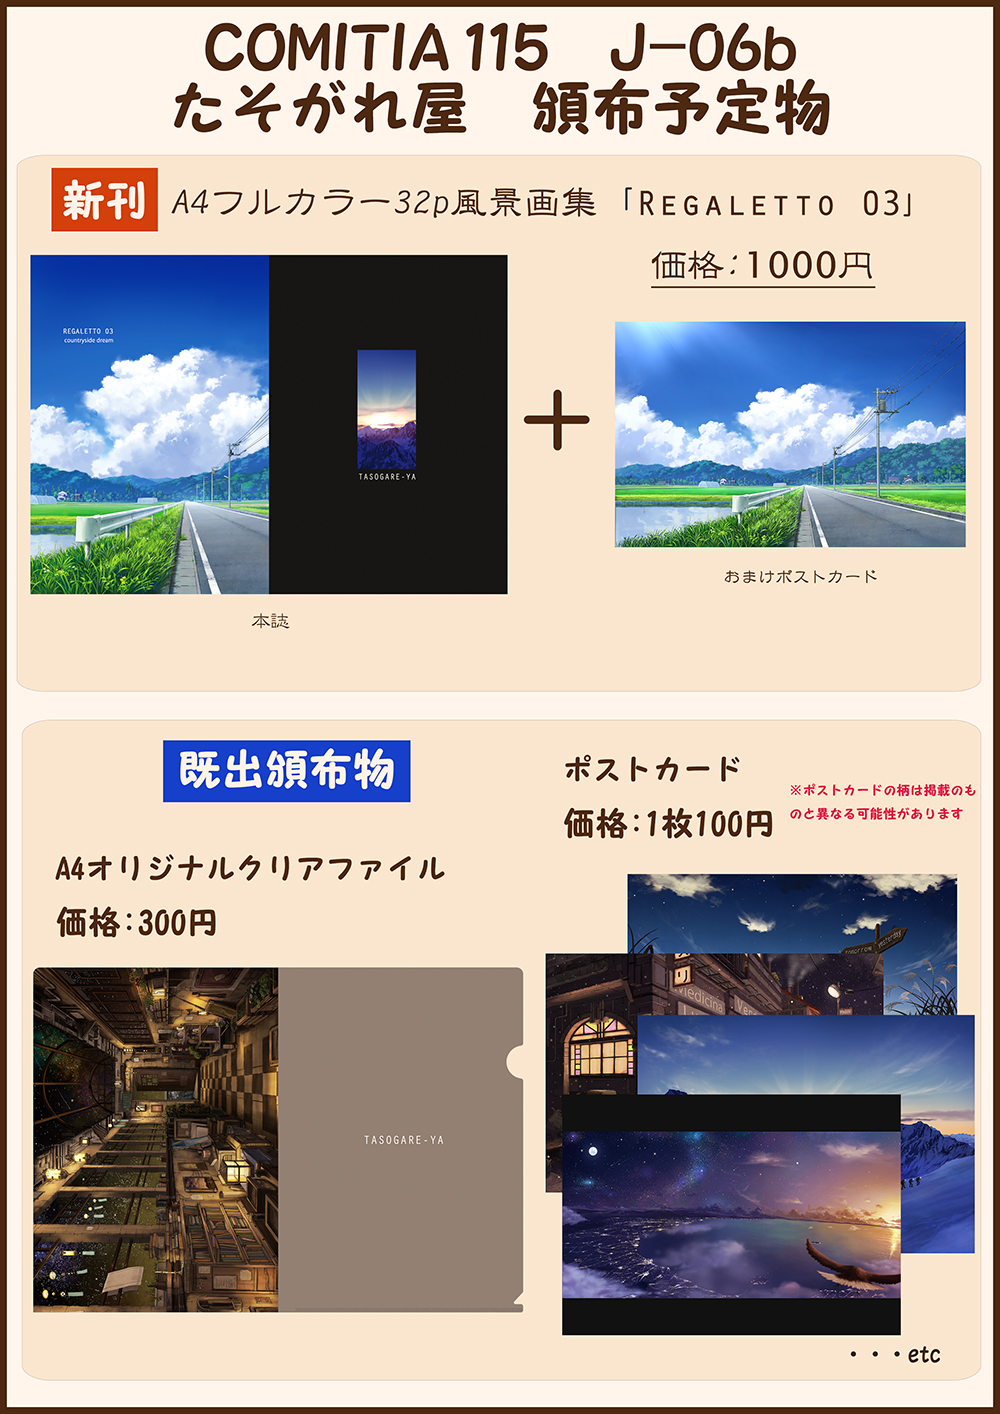 20160127003126fe8.jpg